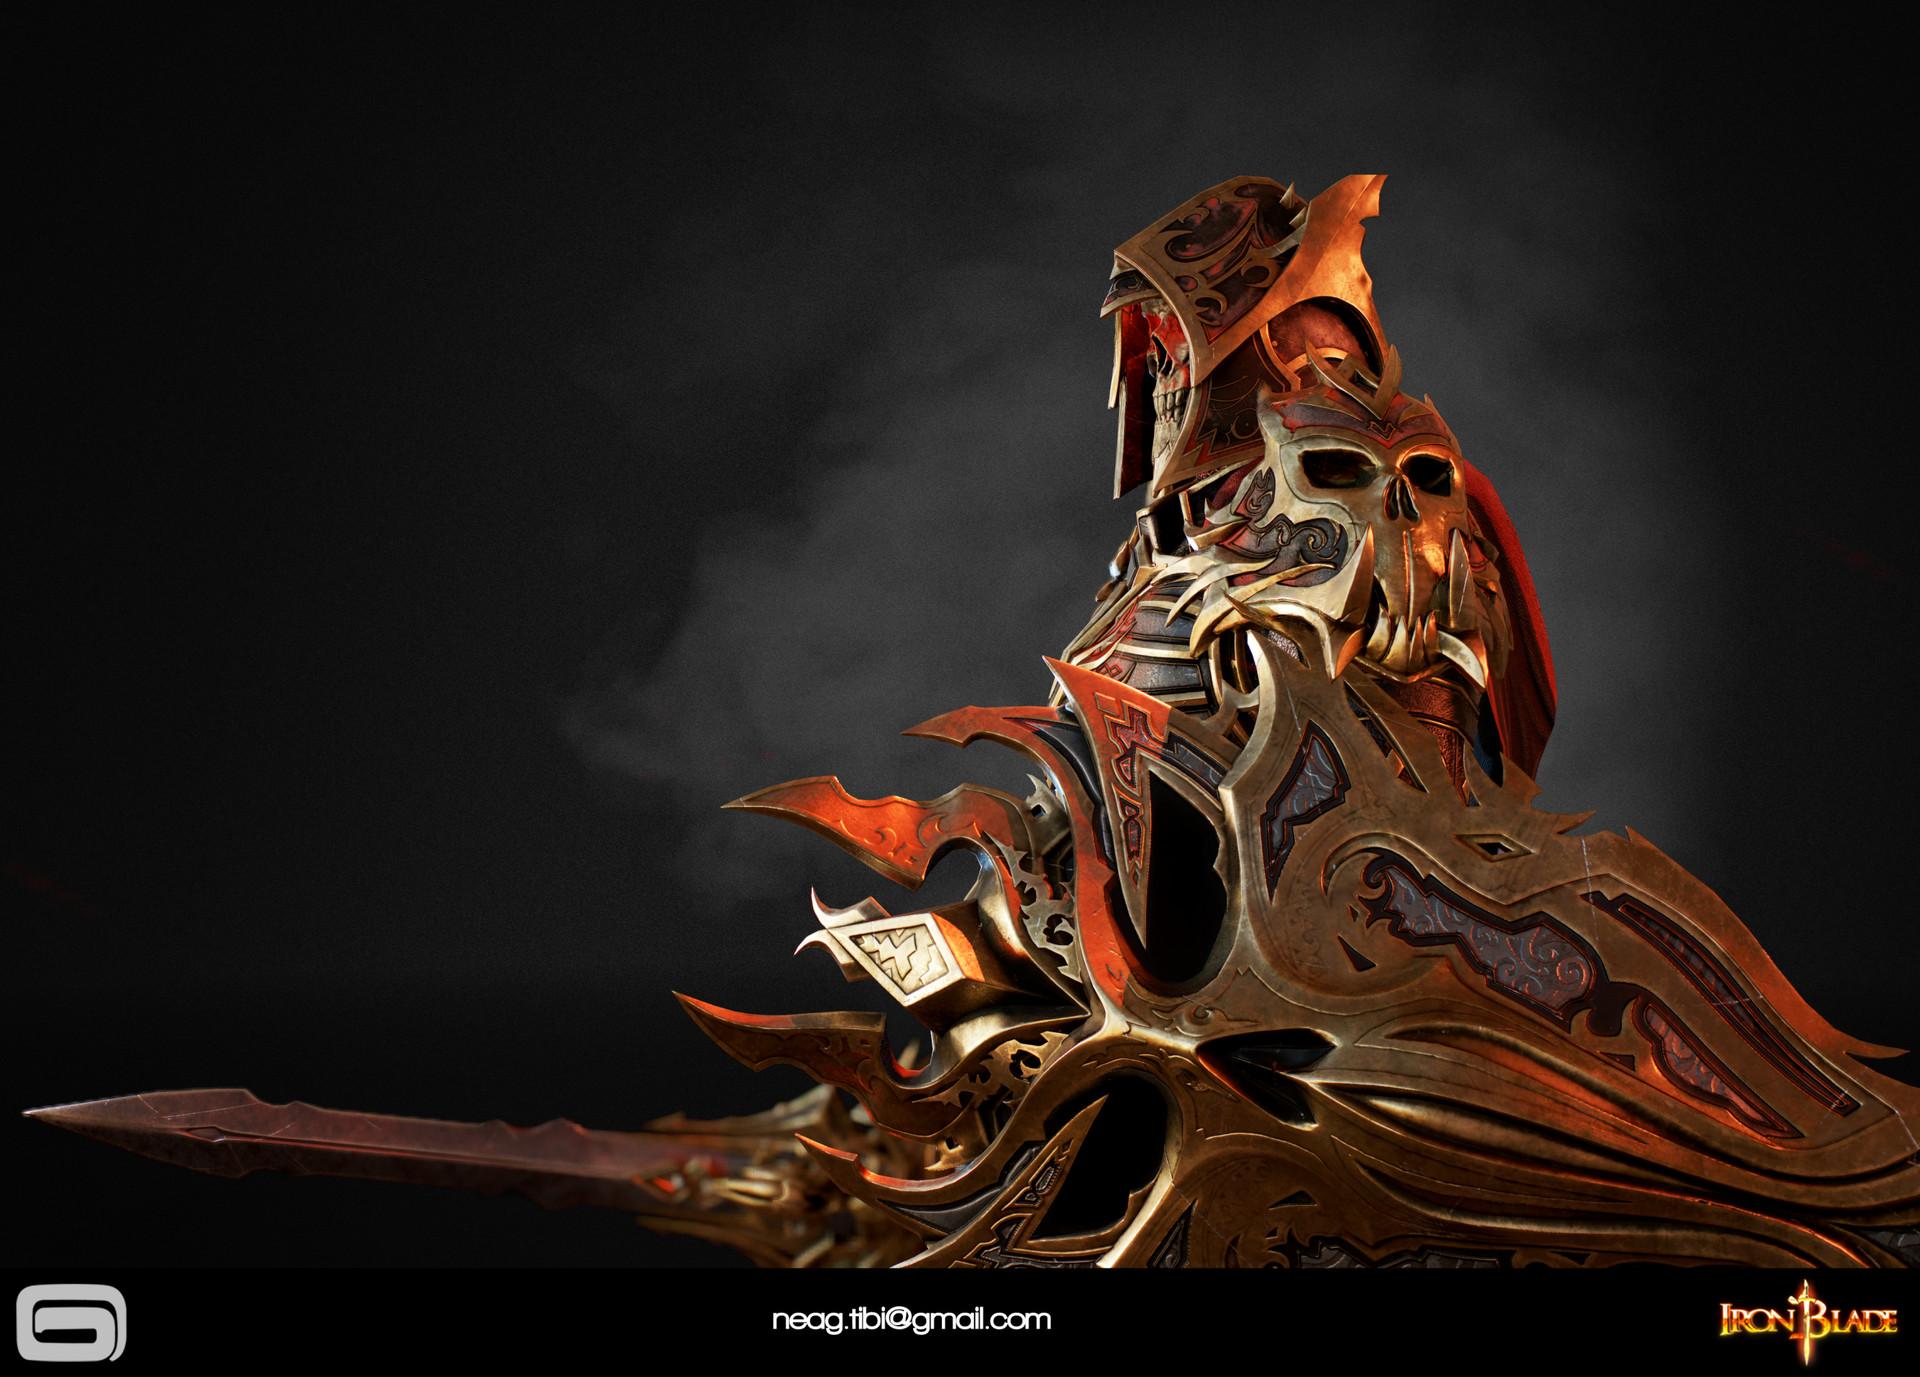 Tibi neag tibi neag death reaper 2 low 19